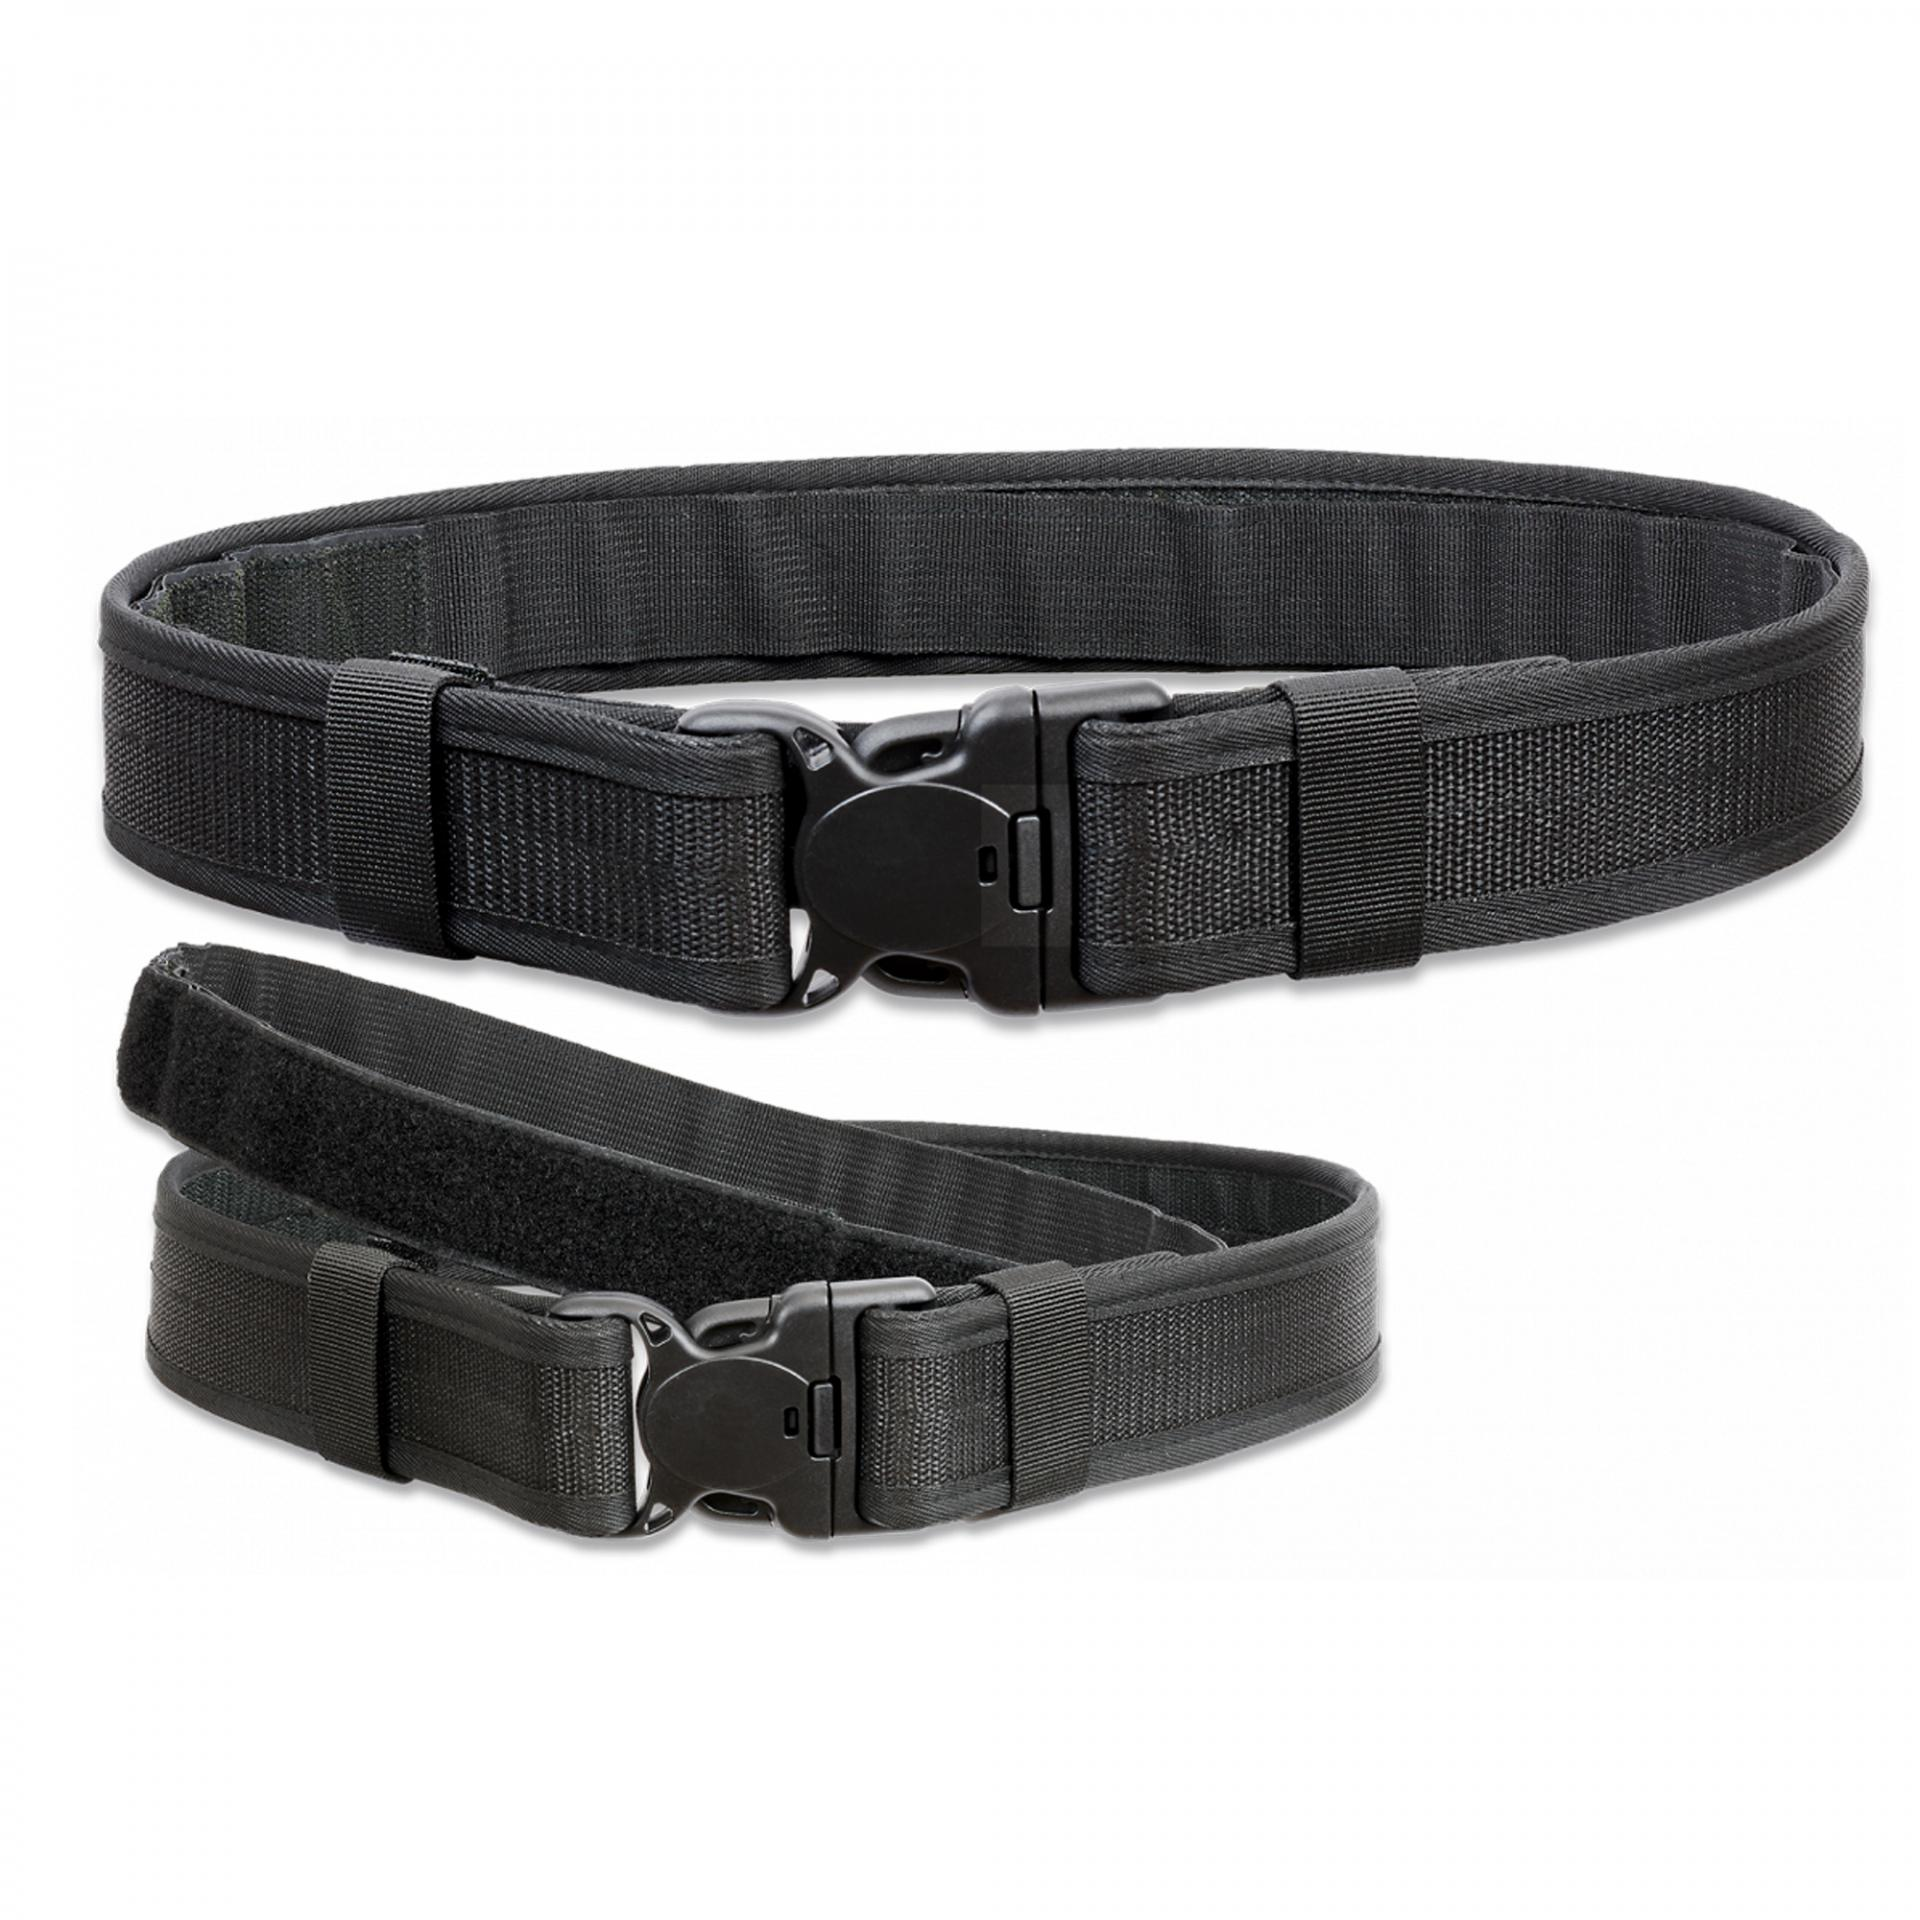 Cinturon Policial Doble. tallas S/M , L / XL